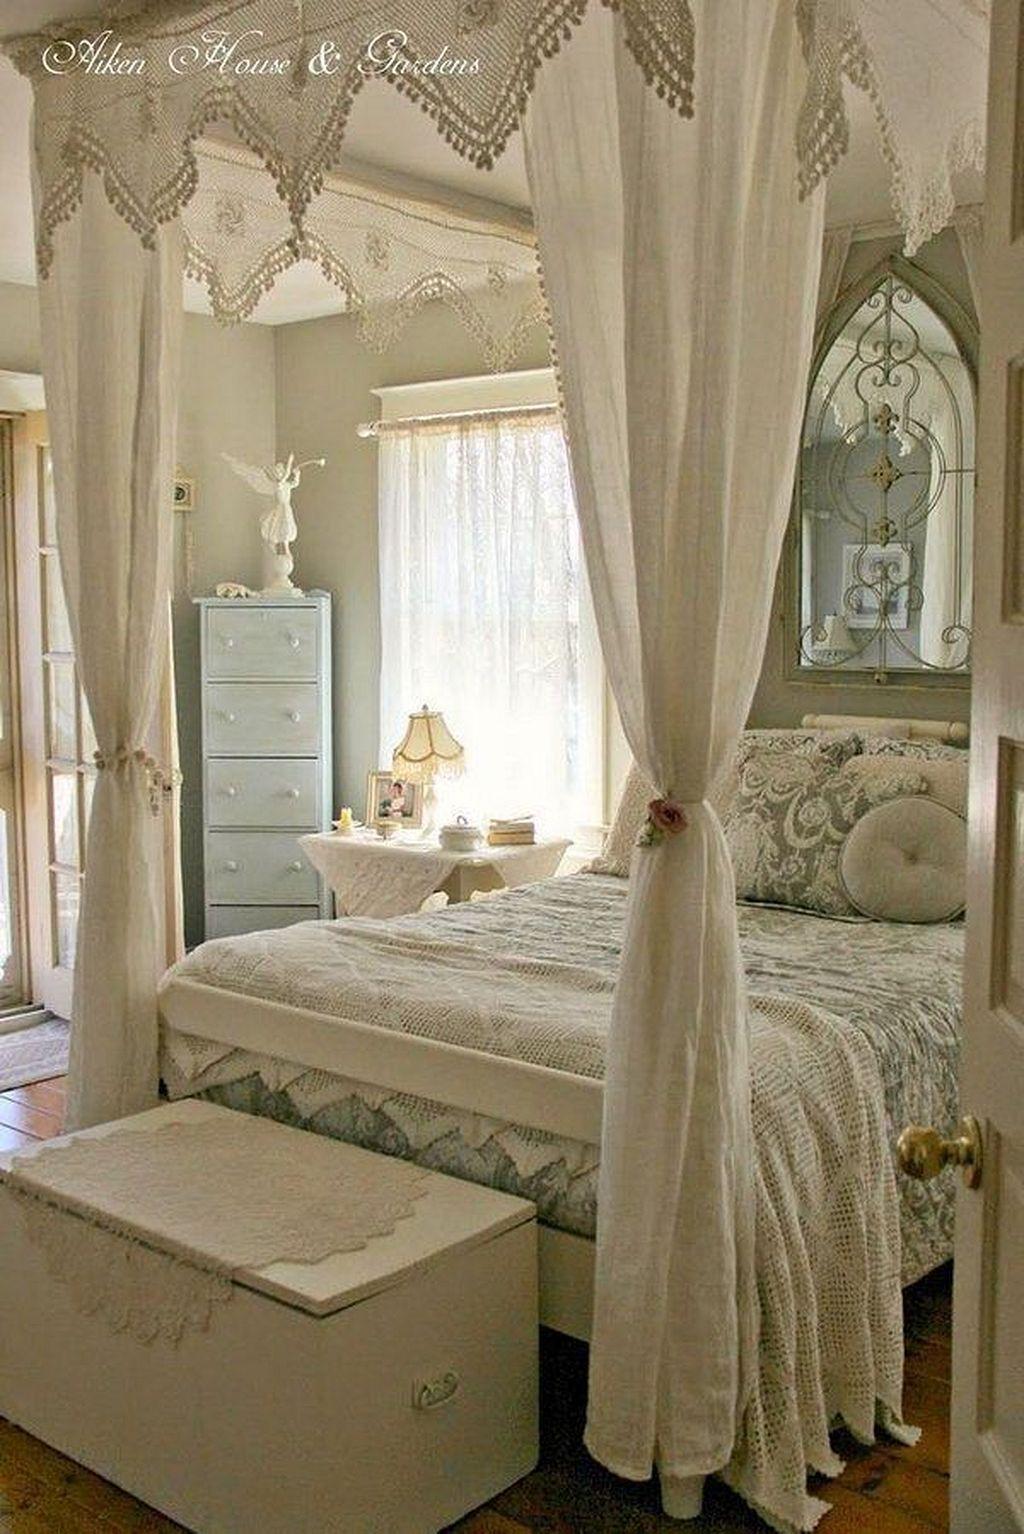 49 Stylish Vintage Bedroom Design Ideas On A Budget